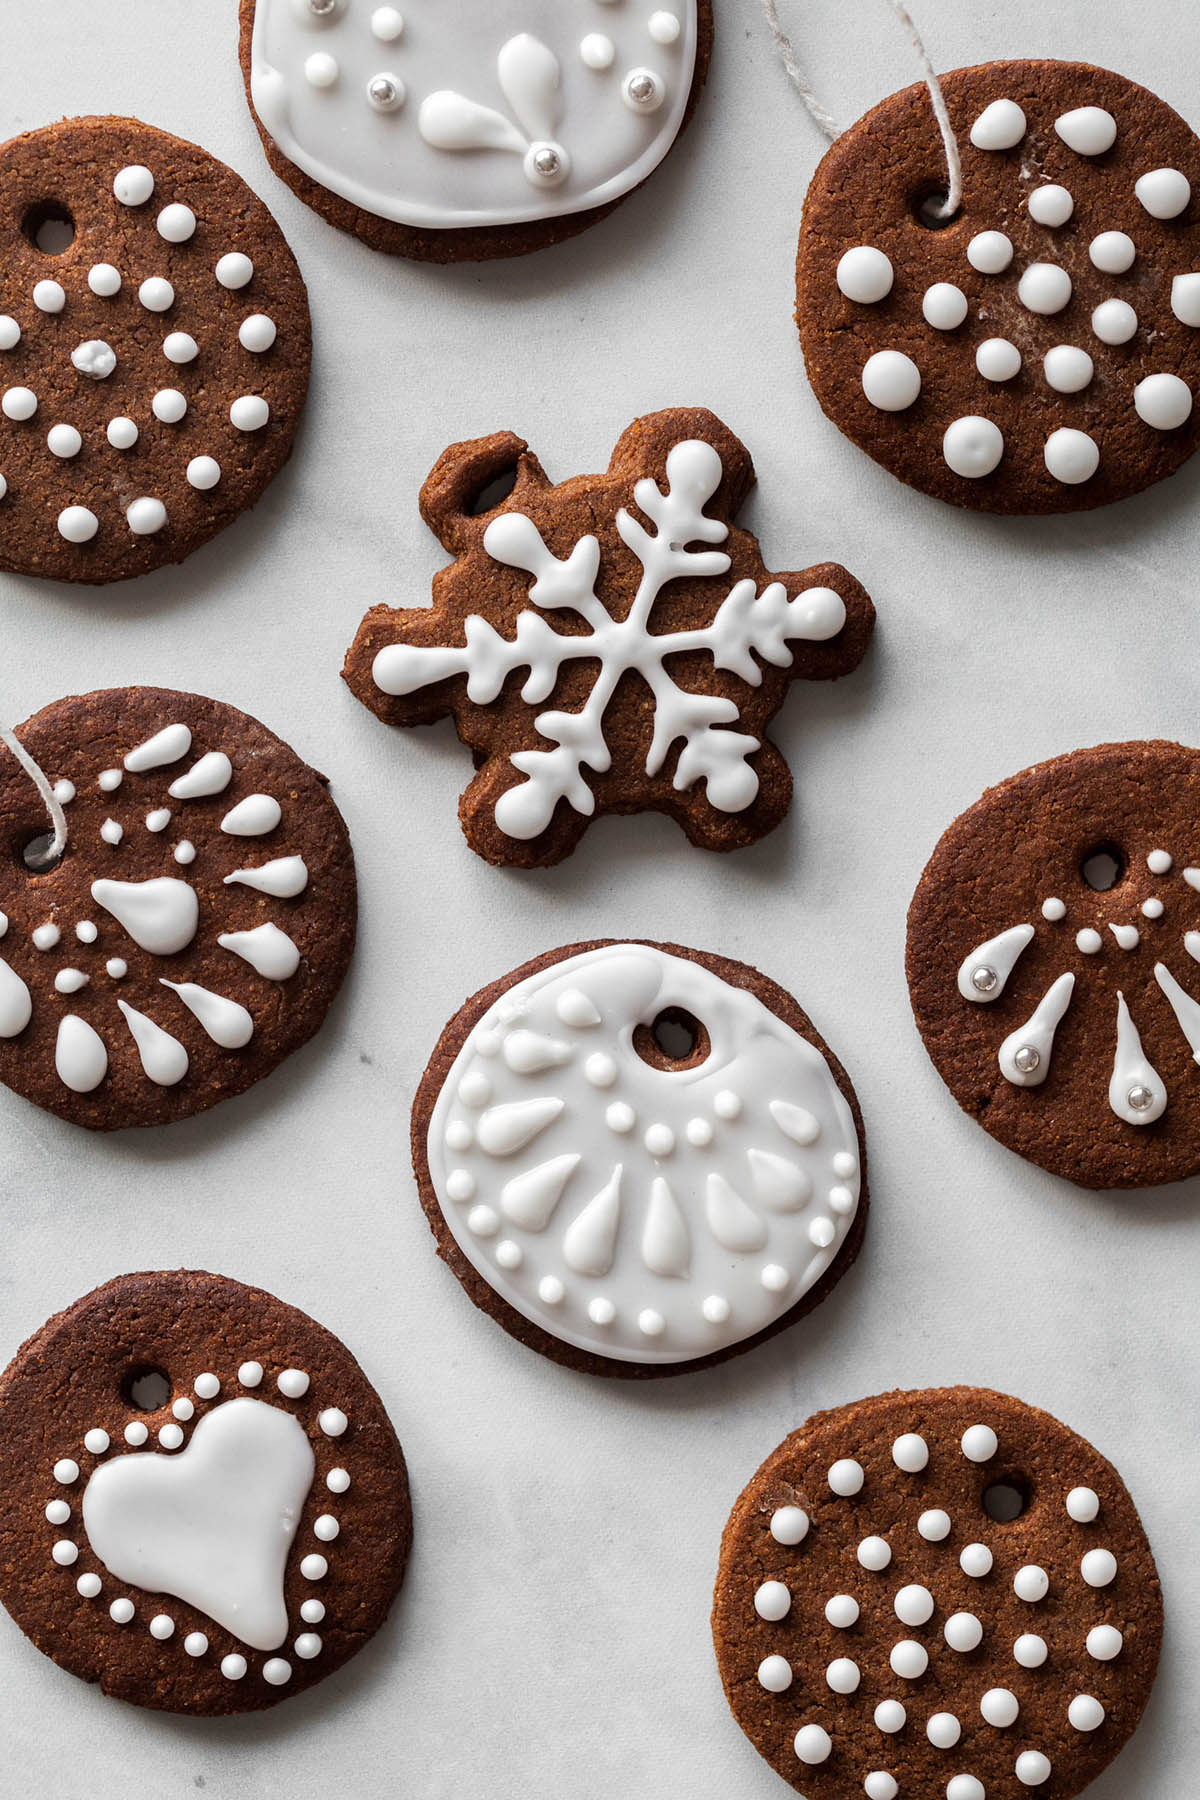 Decorated vegan gingerbread cookies.